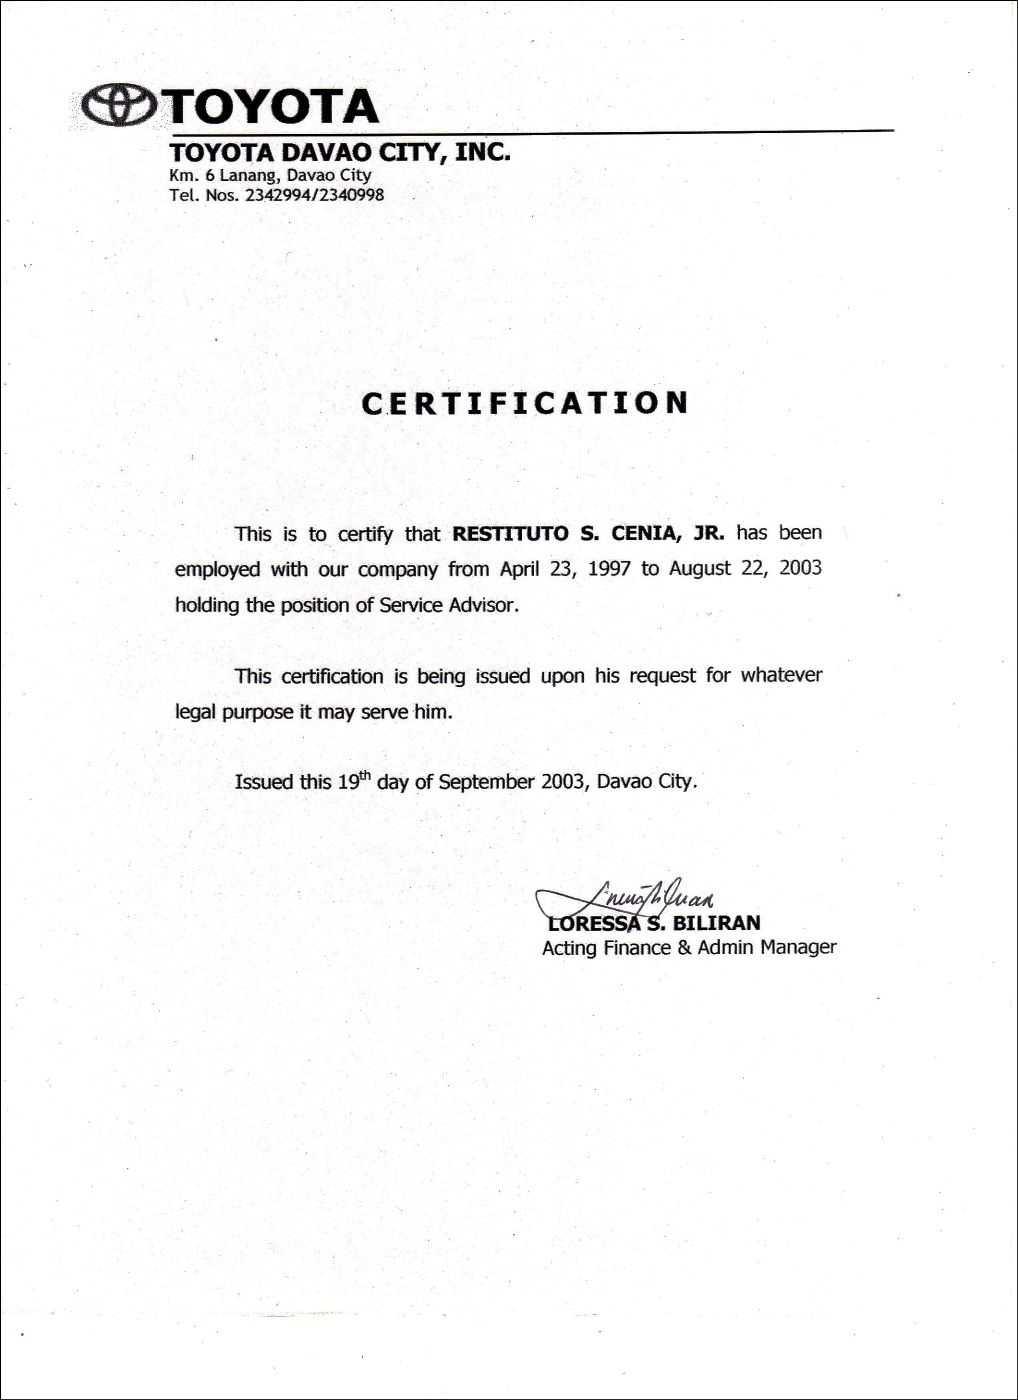 Employment Certificate Sample Best Templates Pinterest in Good Job Certificate Template